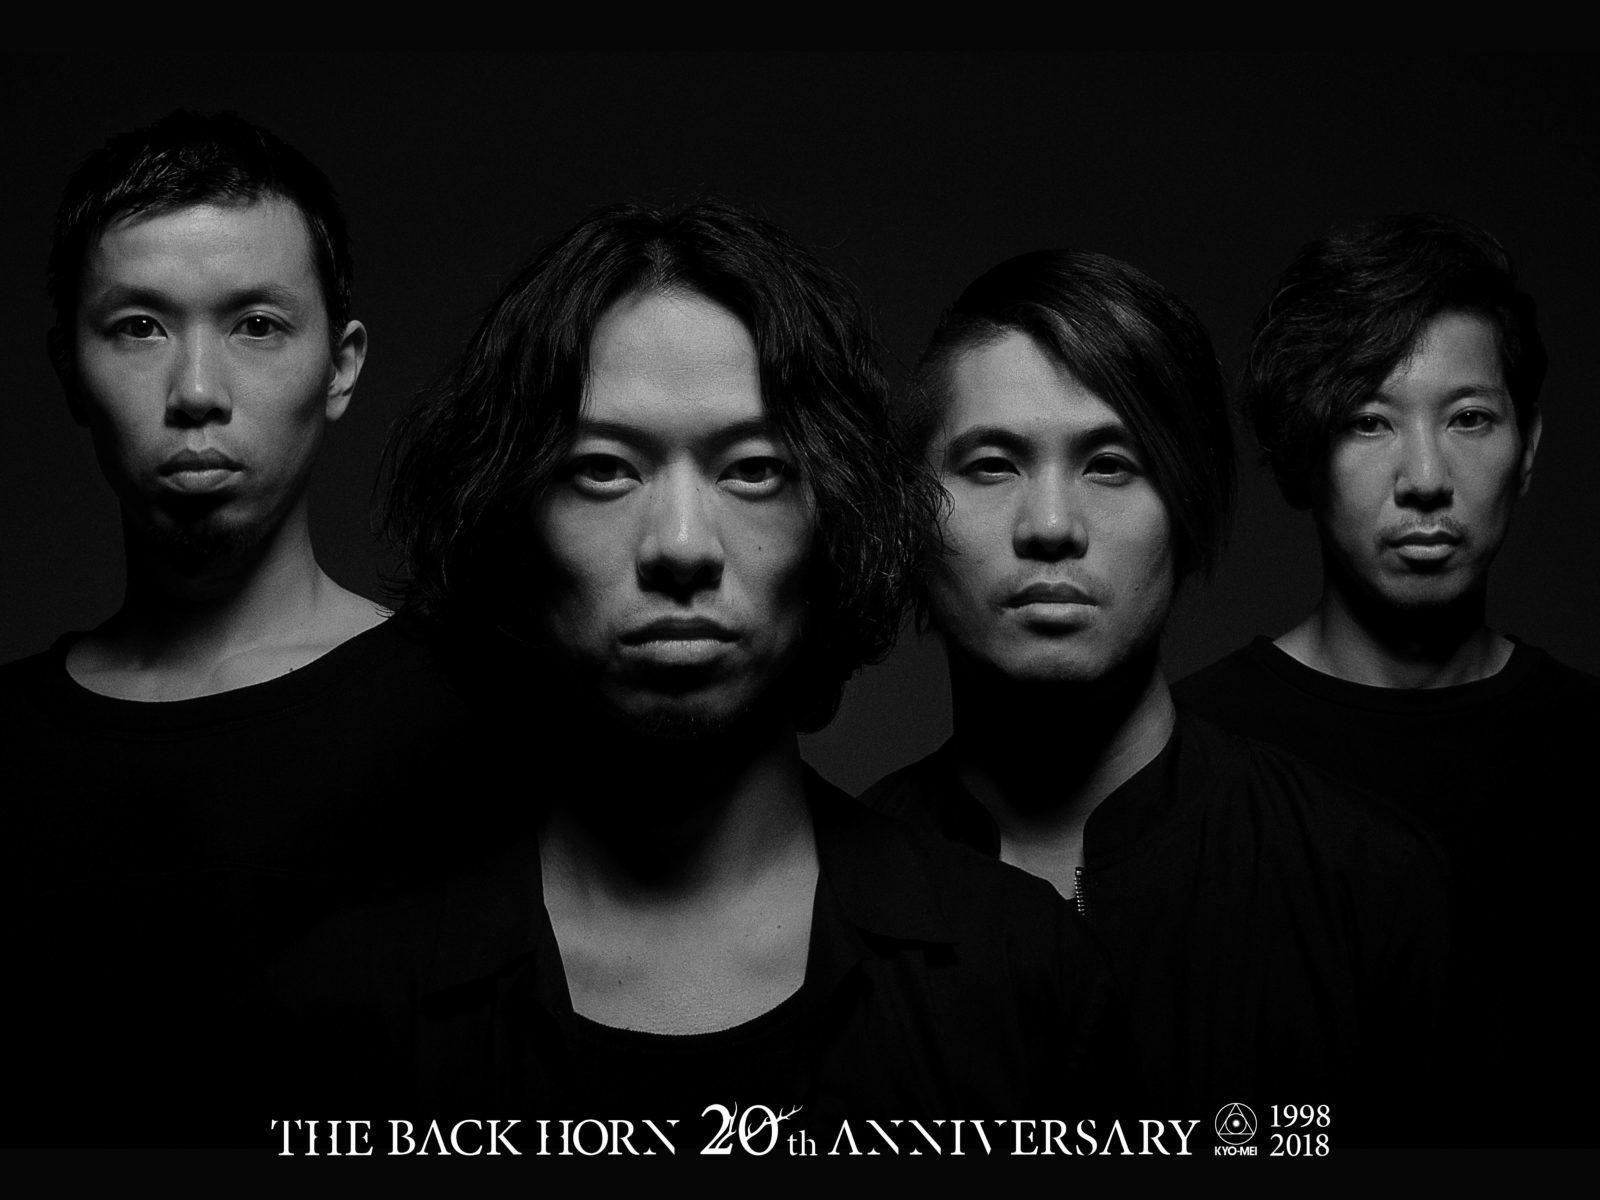 THE BACK HORN、結成20周年記念インディーズ楽曲を再録したNEWアルバムのトレーラー映像が公開サムネイル画像